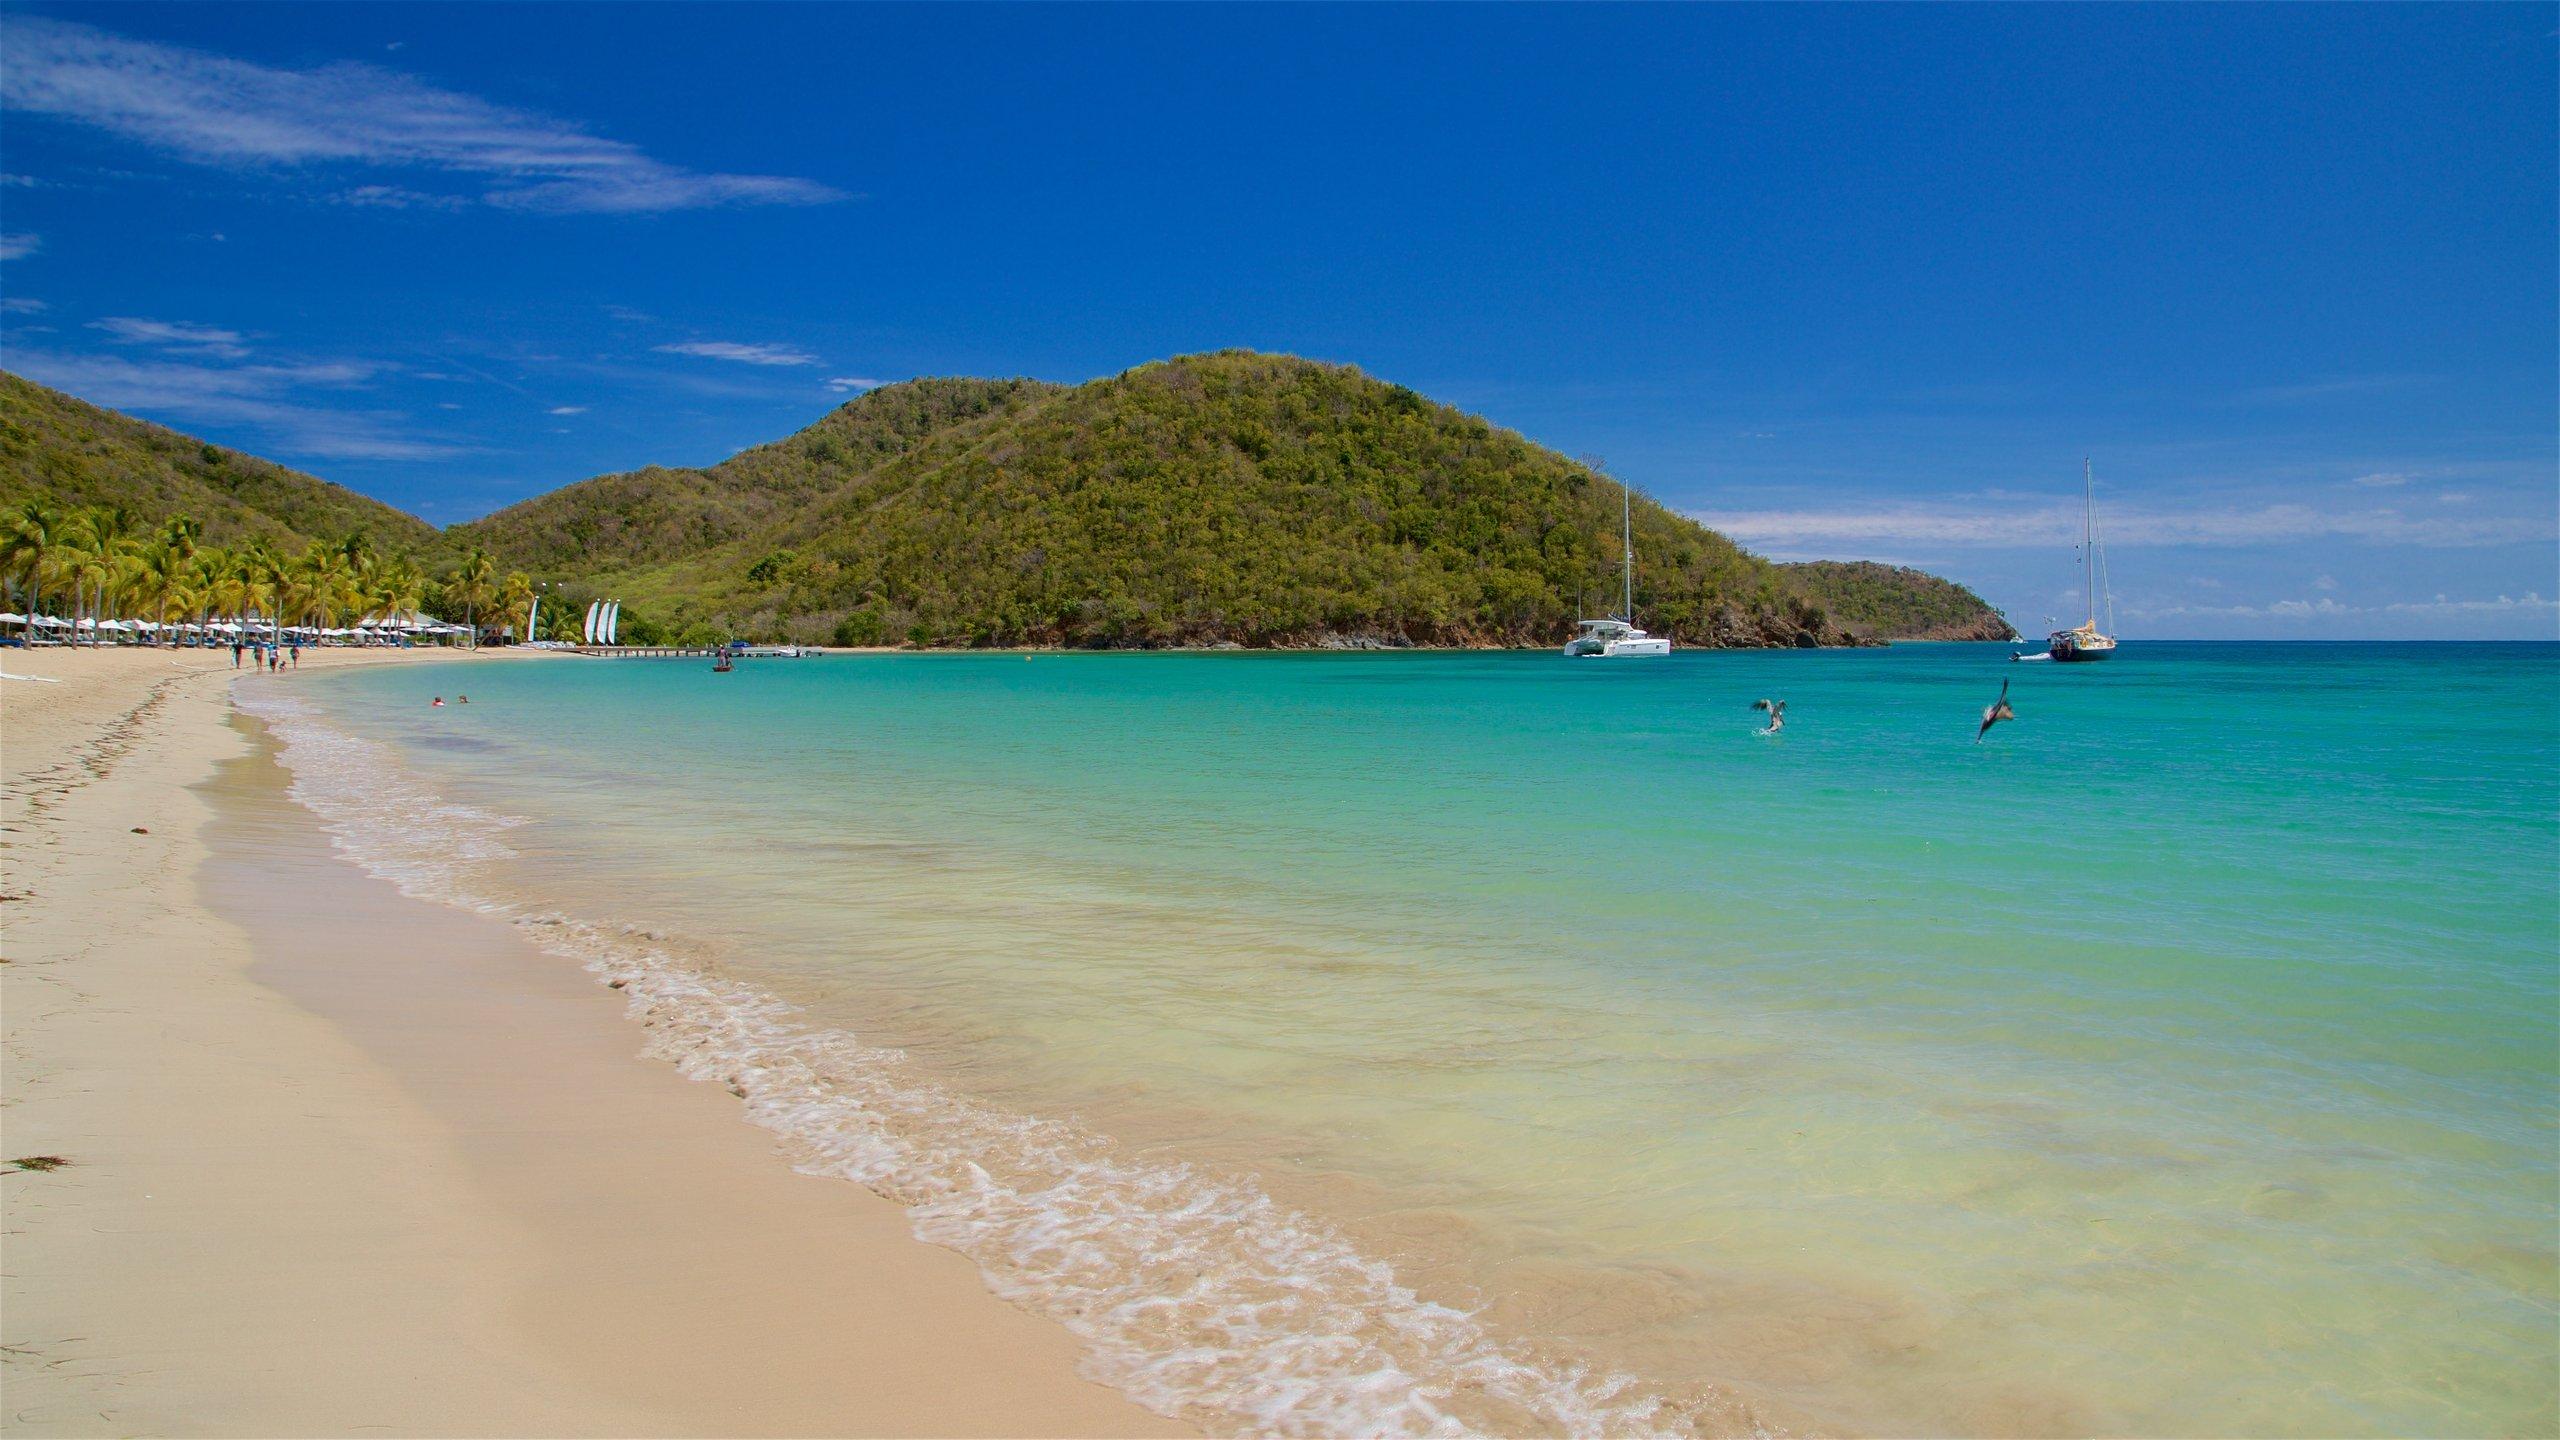 Carlisle Bay Beach, Carlisle Bay, Saint Mary, Antigua and Barbuda